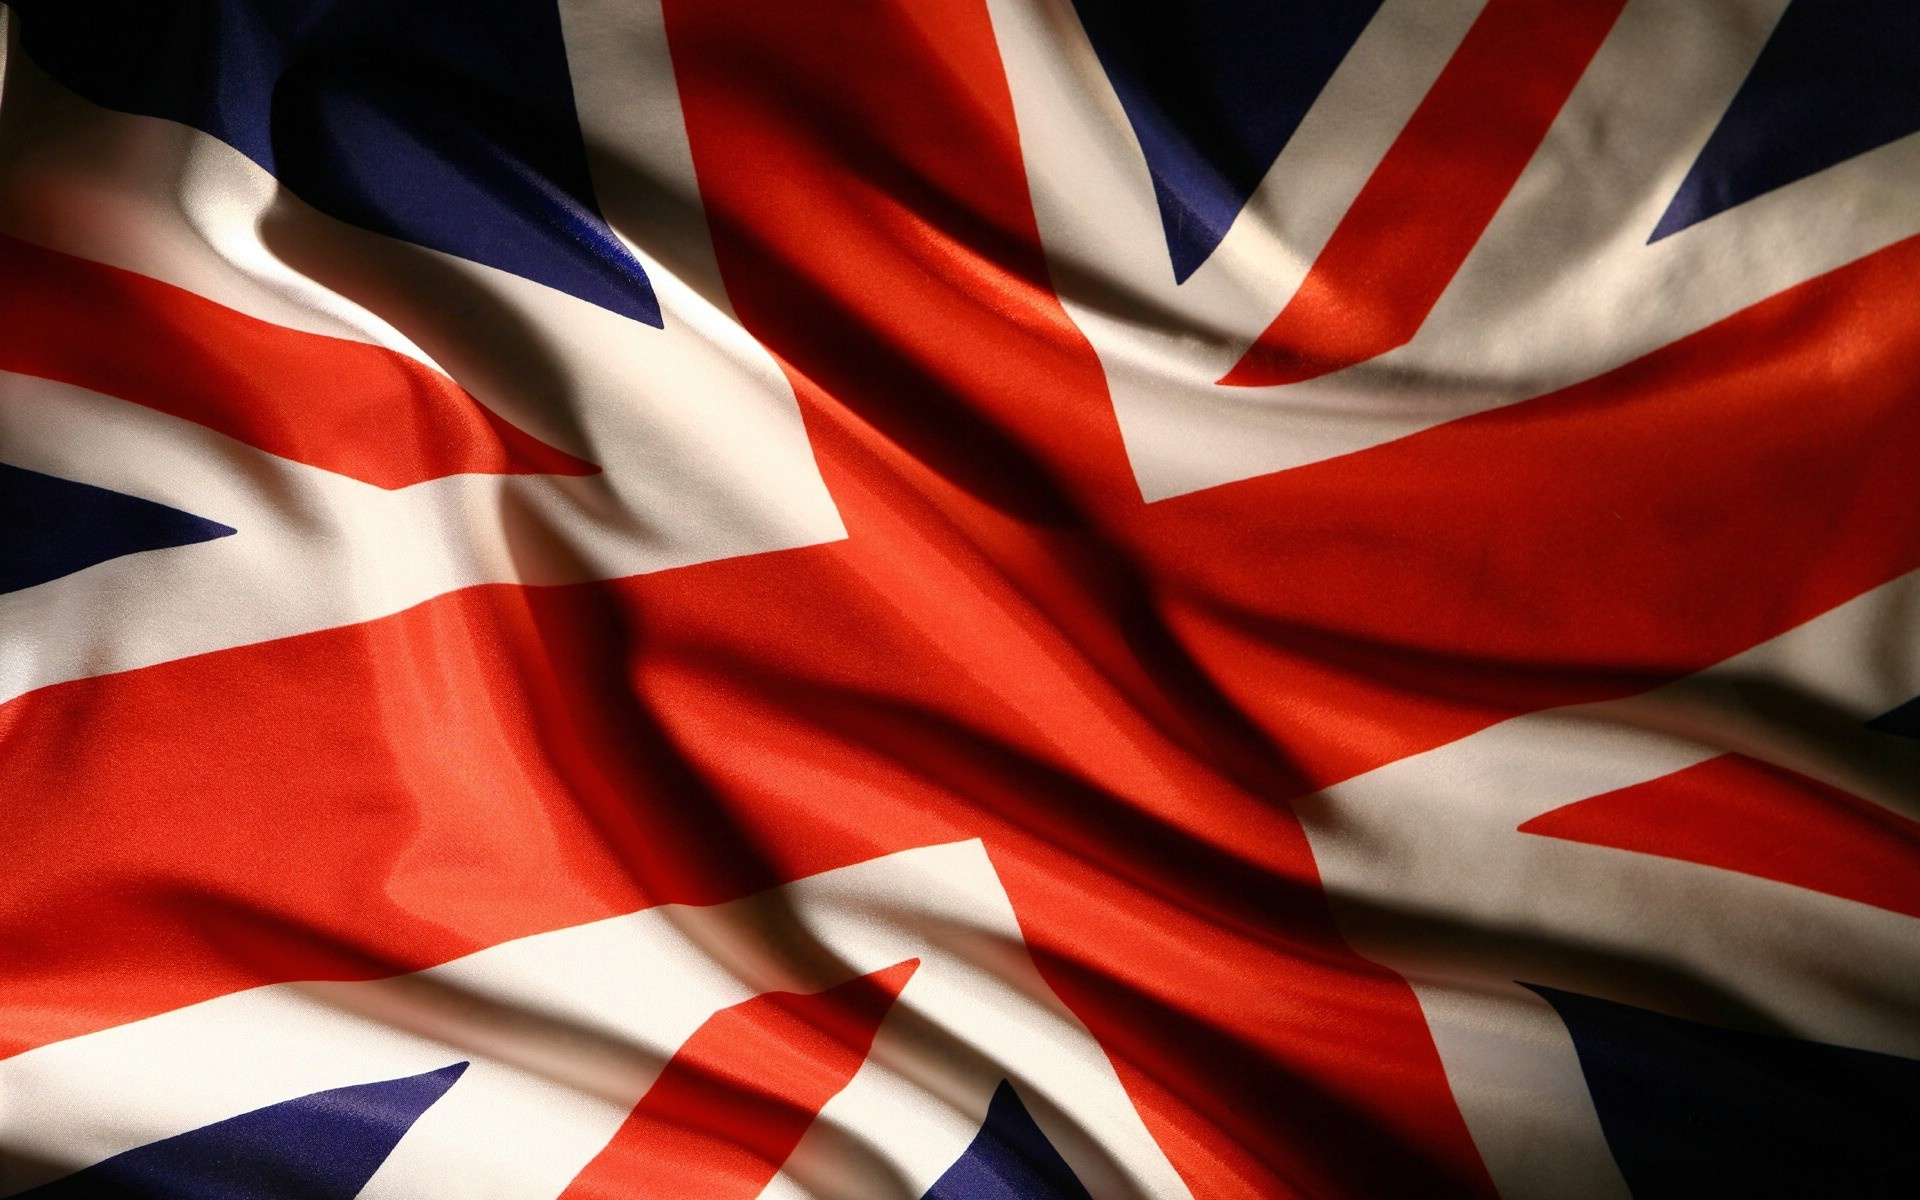 Misc Union Jack 1920x1200